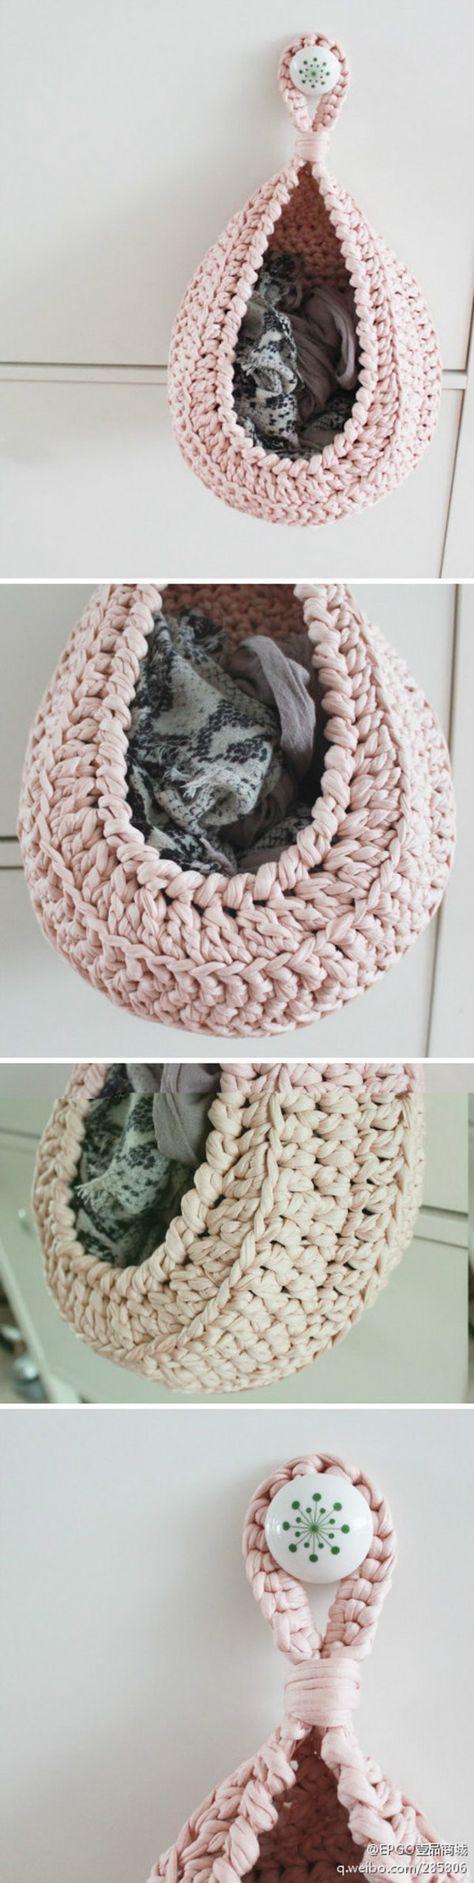 25 DIY Crochet Hammock Free Patterns | 1883x474